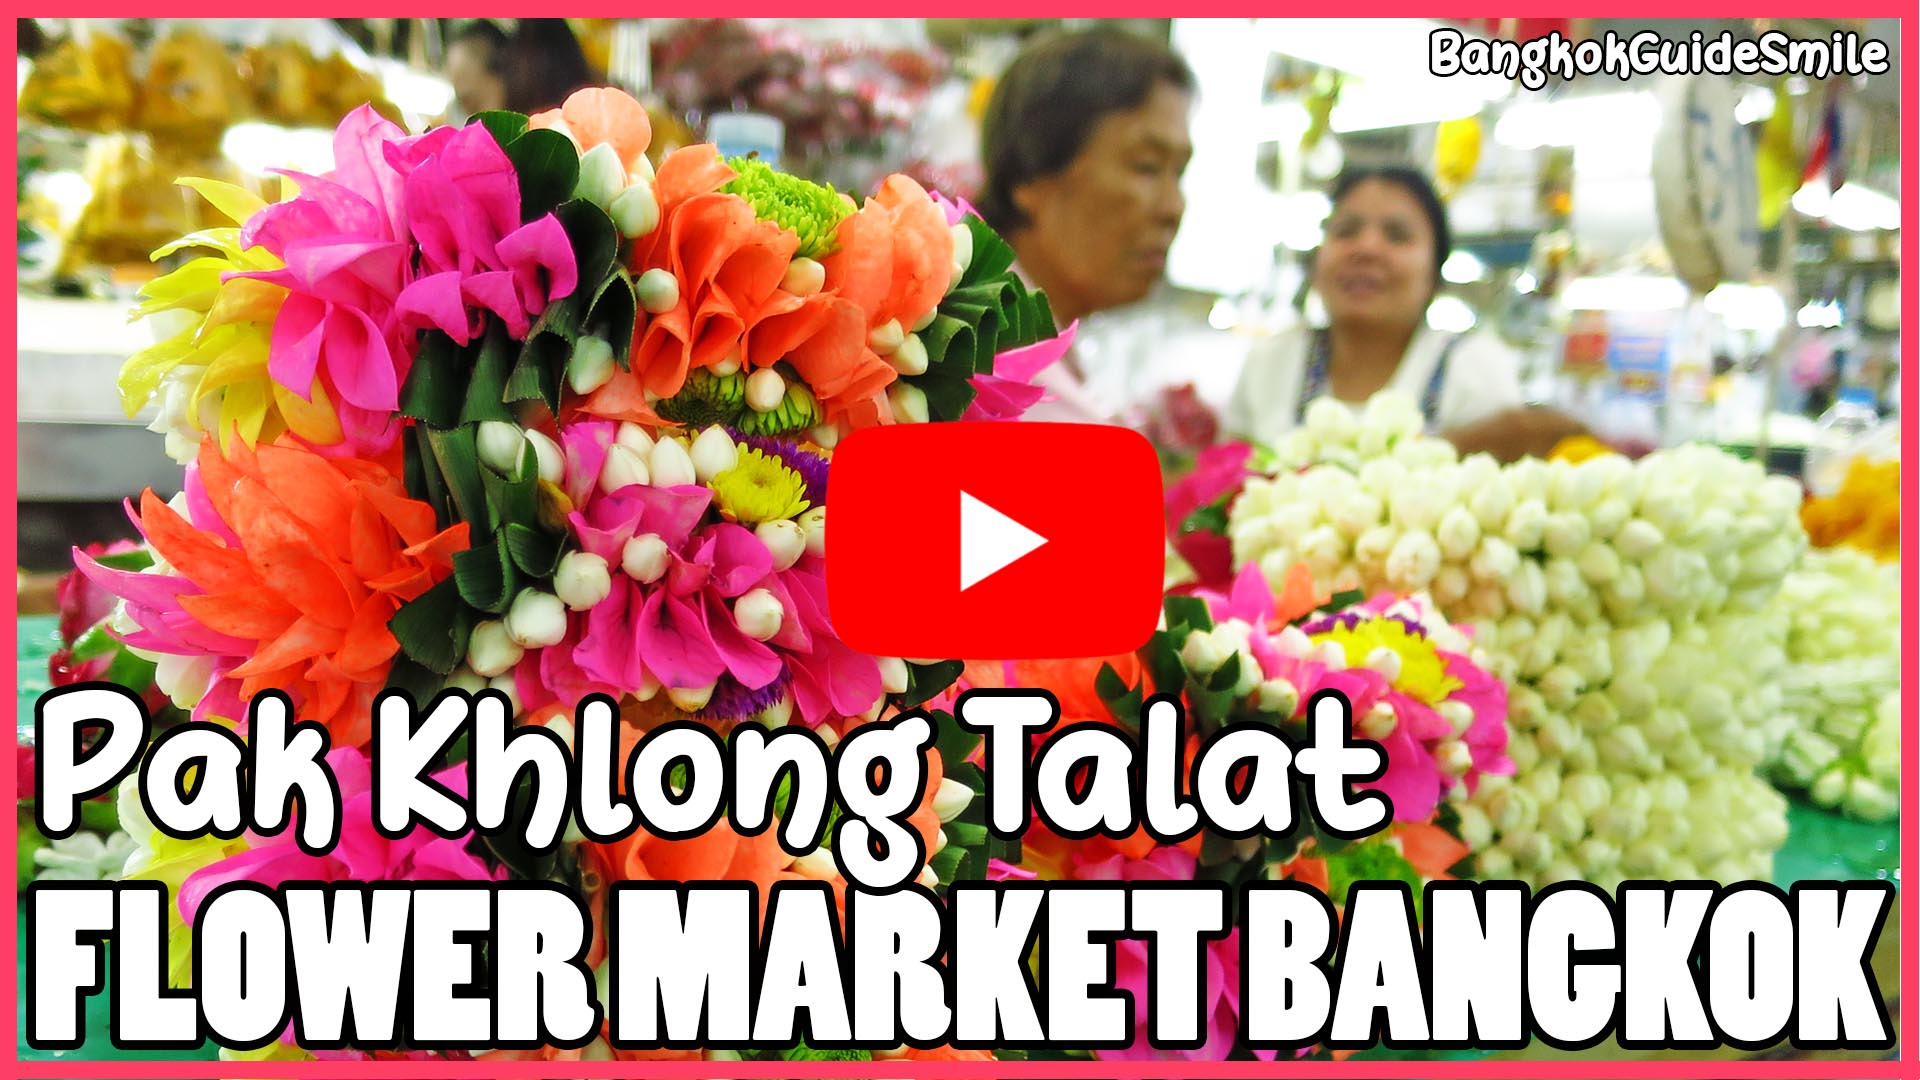 Bangkok-Guide-Smile-Private-Tour-Flower-Market-Pak-Khlong-Talat-02.jpg